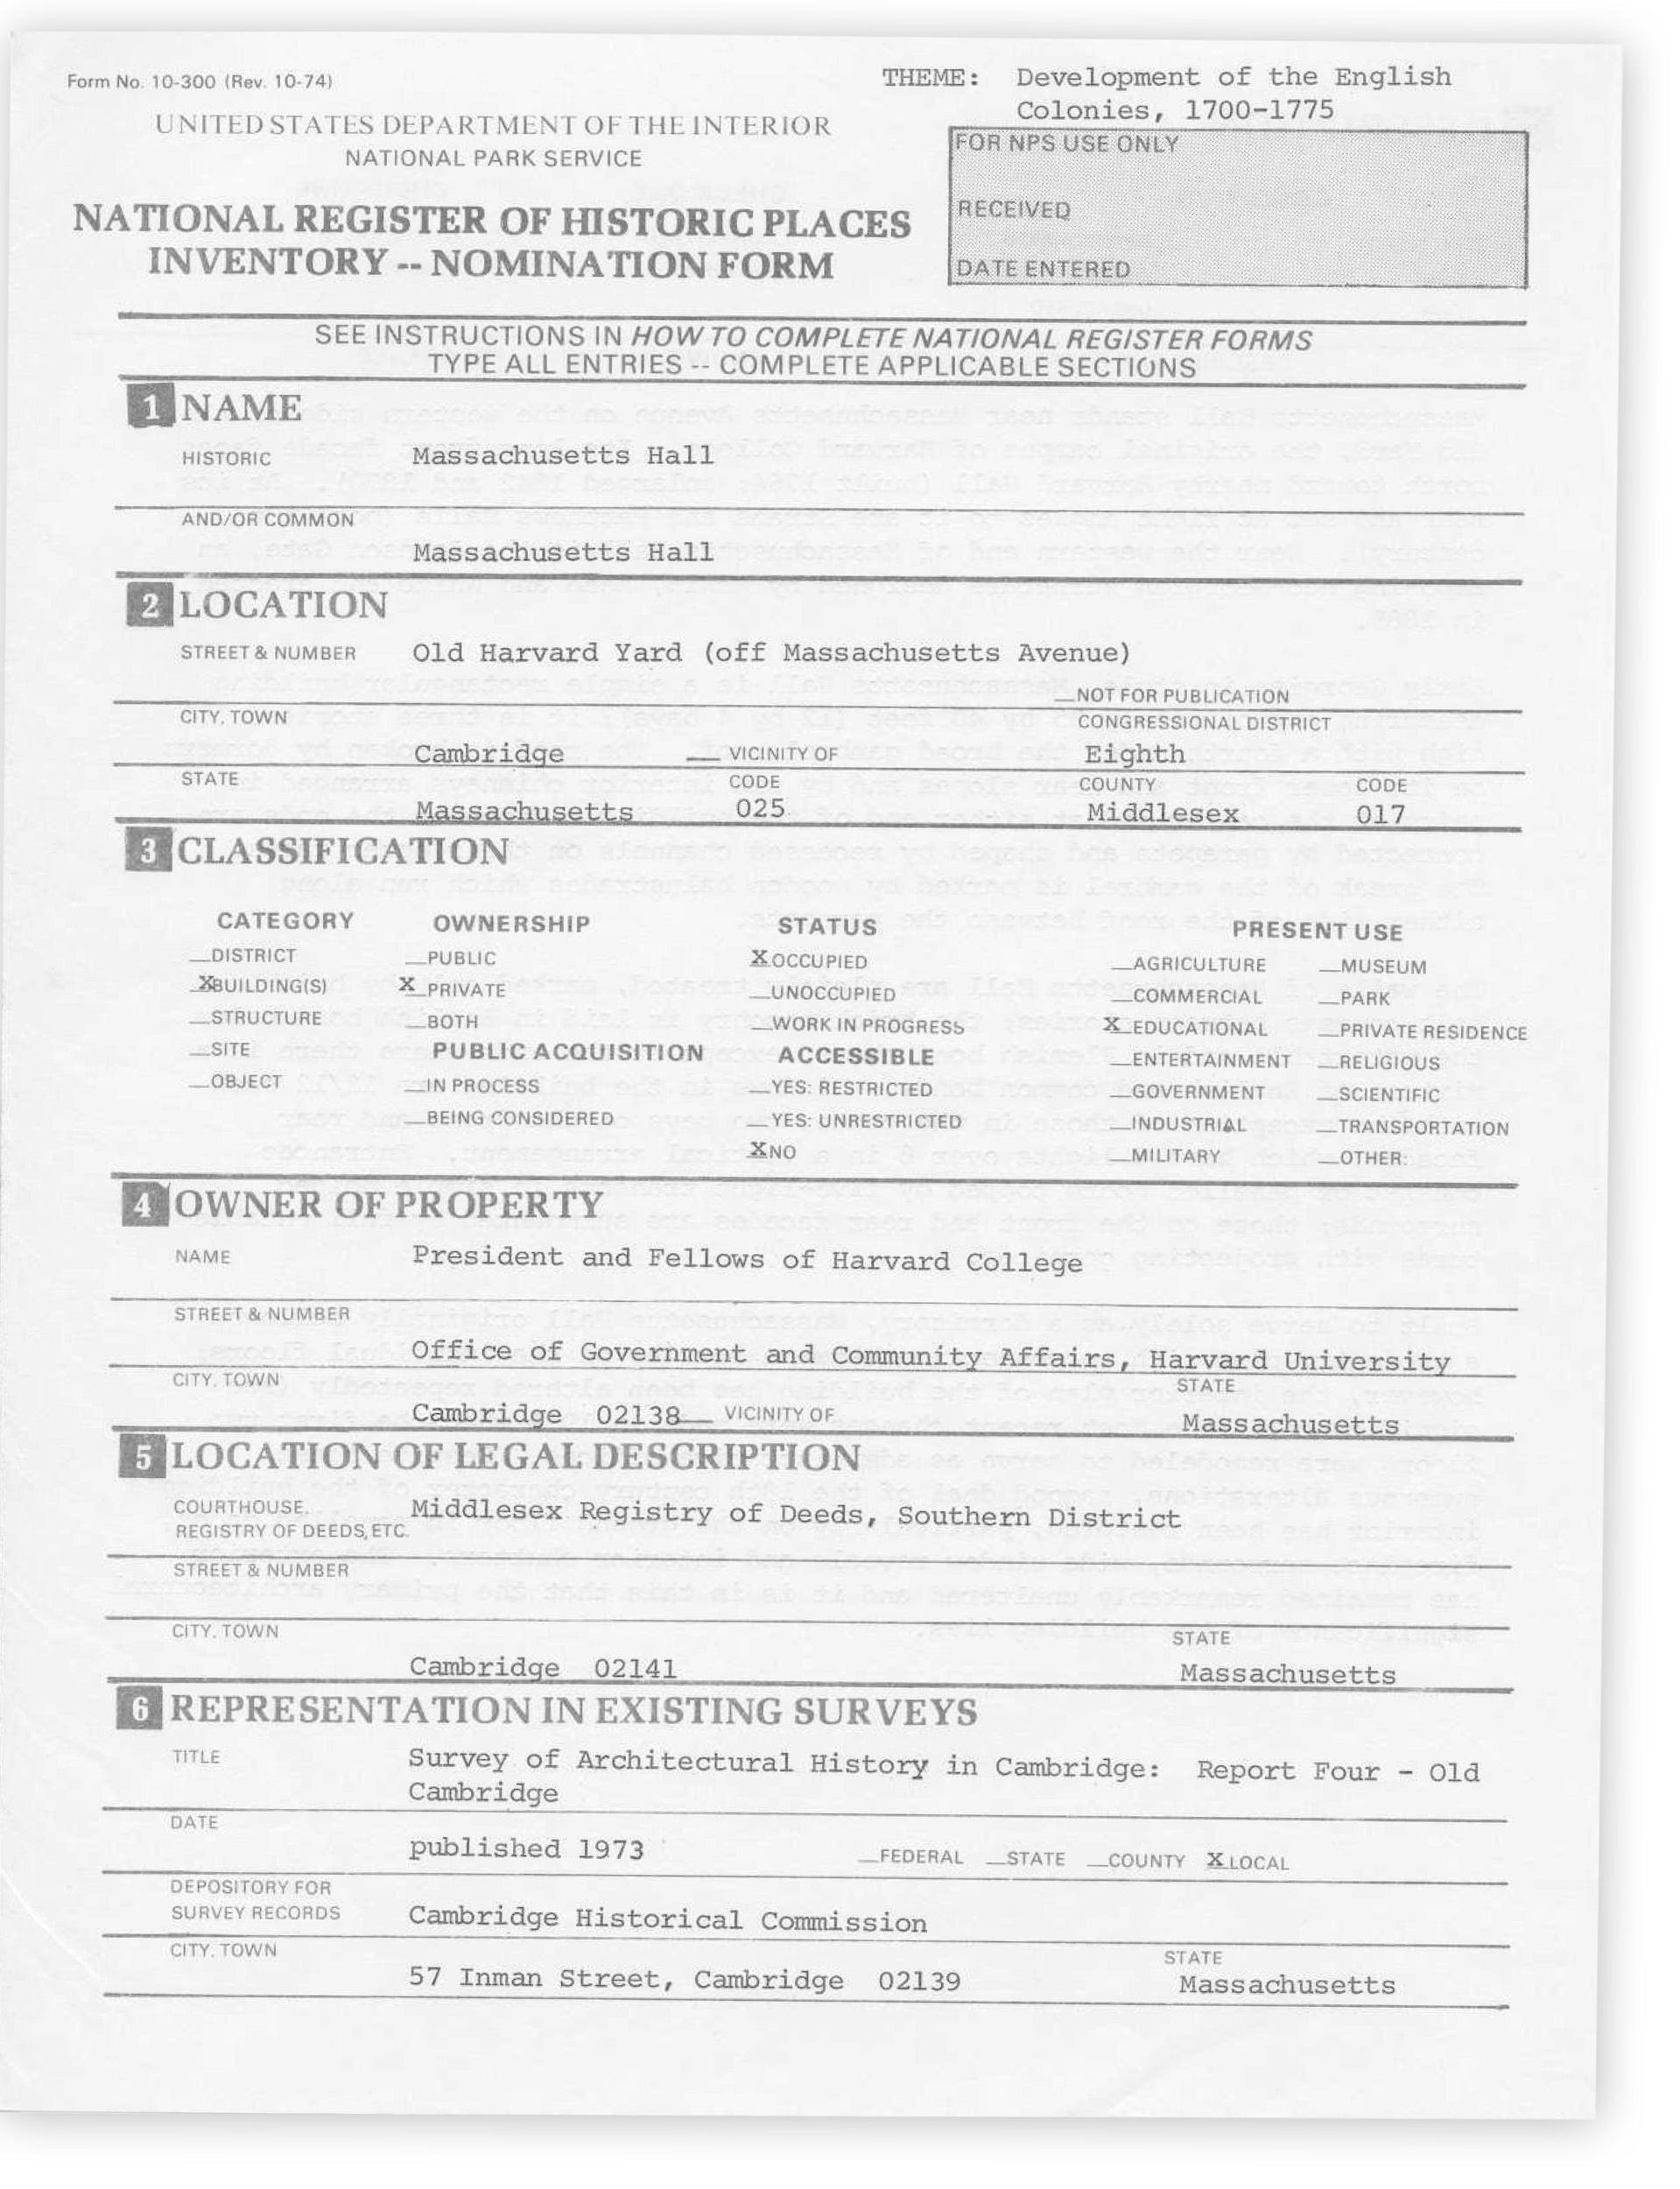 Mass Hall National Historic Landmark nomination form.